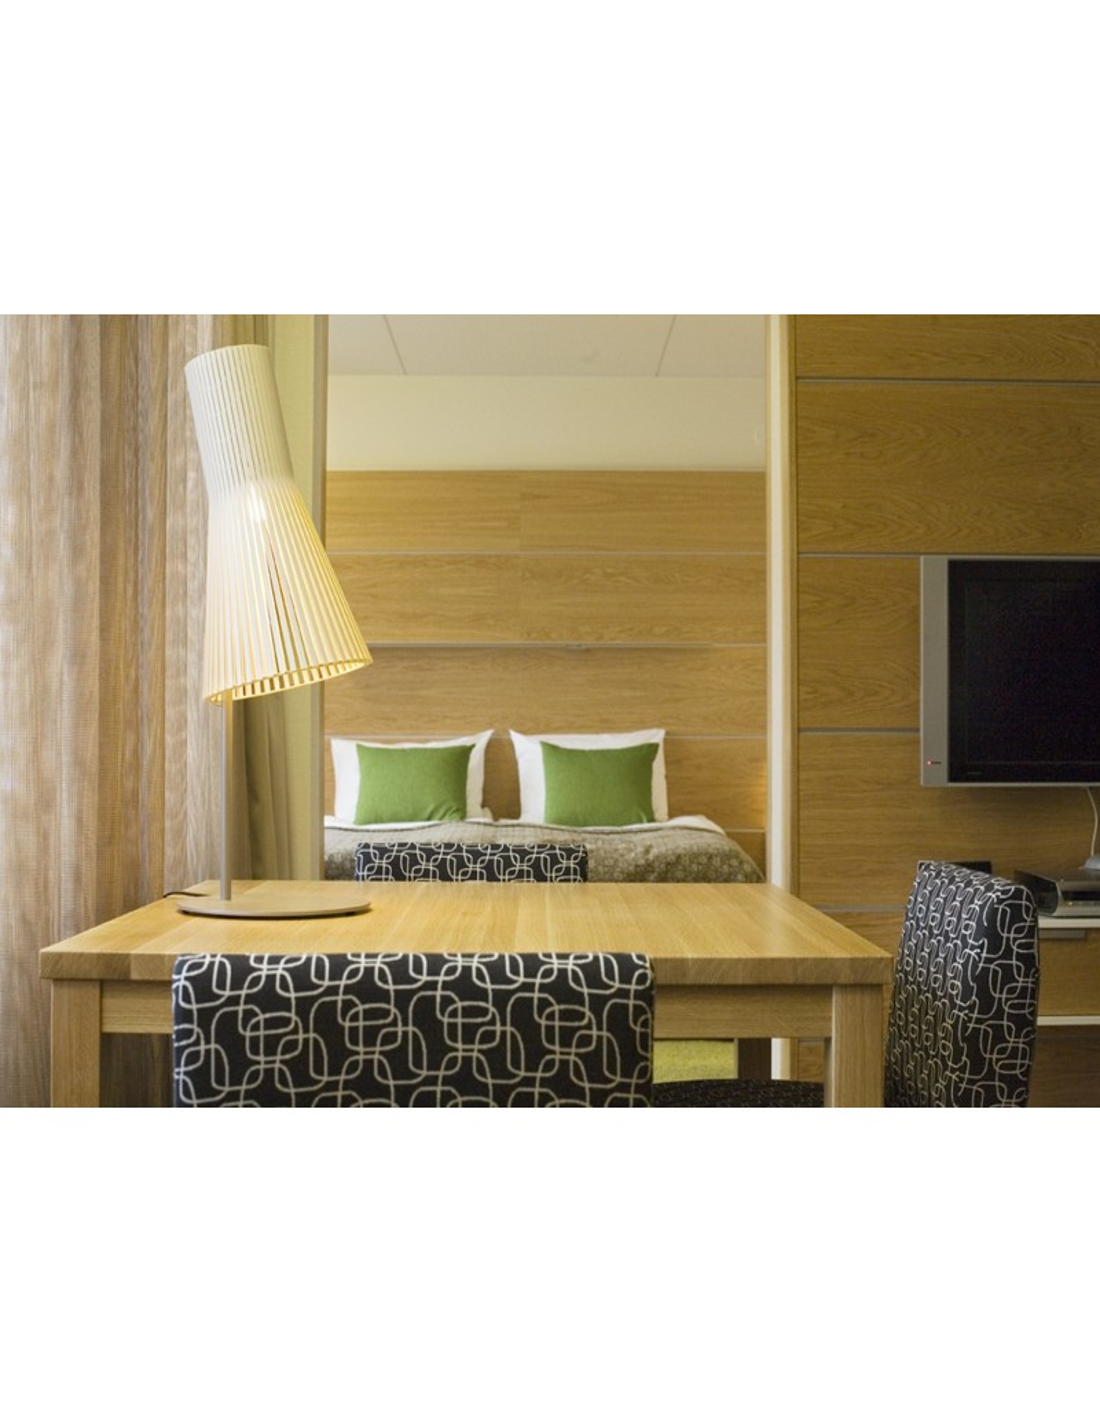 lampe de table secto ou 4220 design seppo koho la boutique danoise. Black Bedroom Furniture Sets. Home Design Ideas